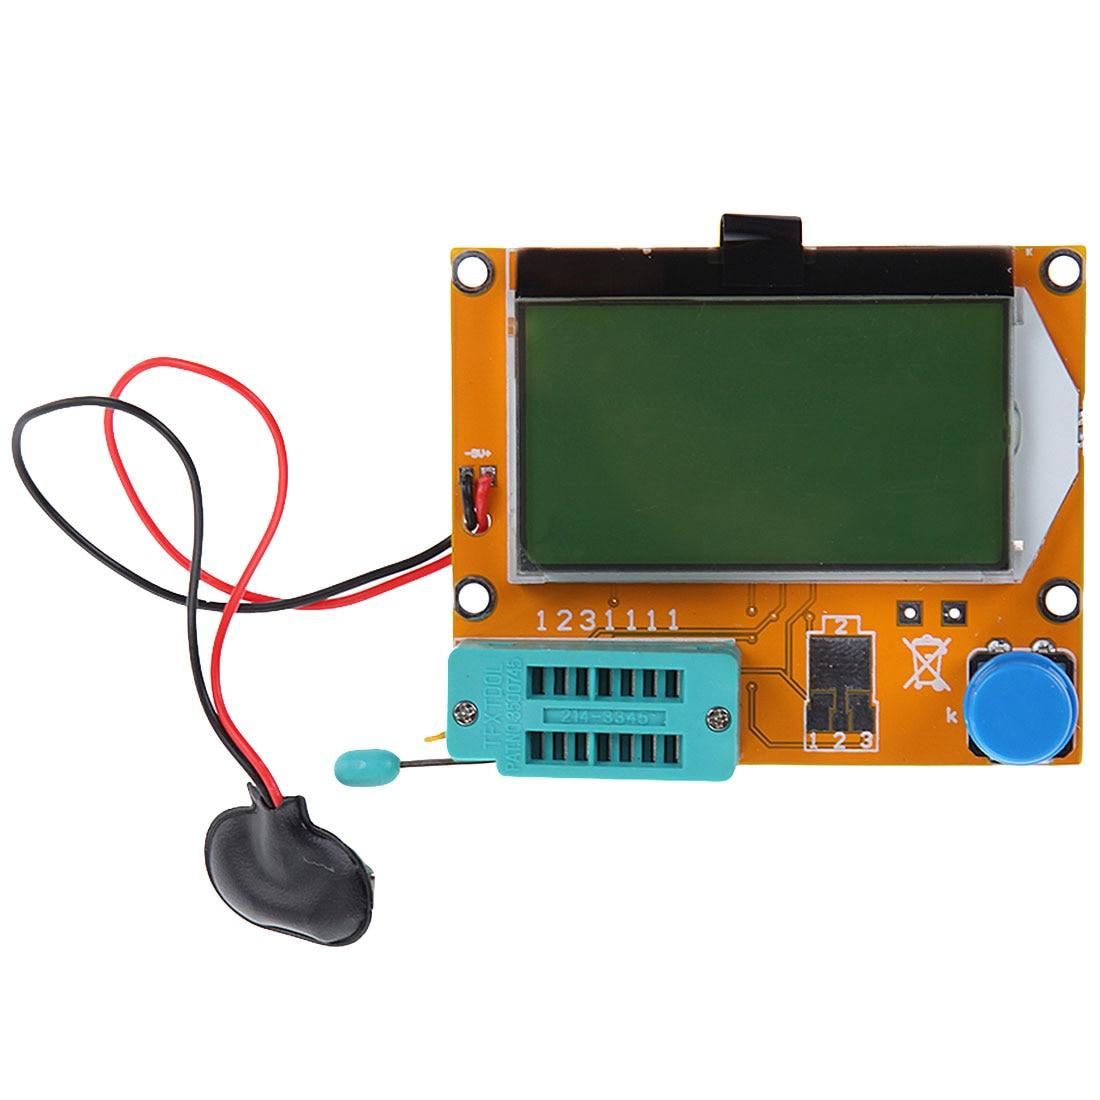 M328 LCR-T4 LCD Transistor Tester Triode Capacitance ESR Meter MOS PNP NPN Kit